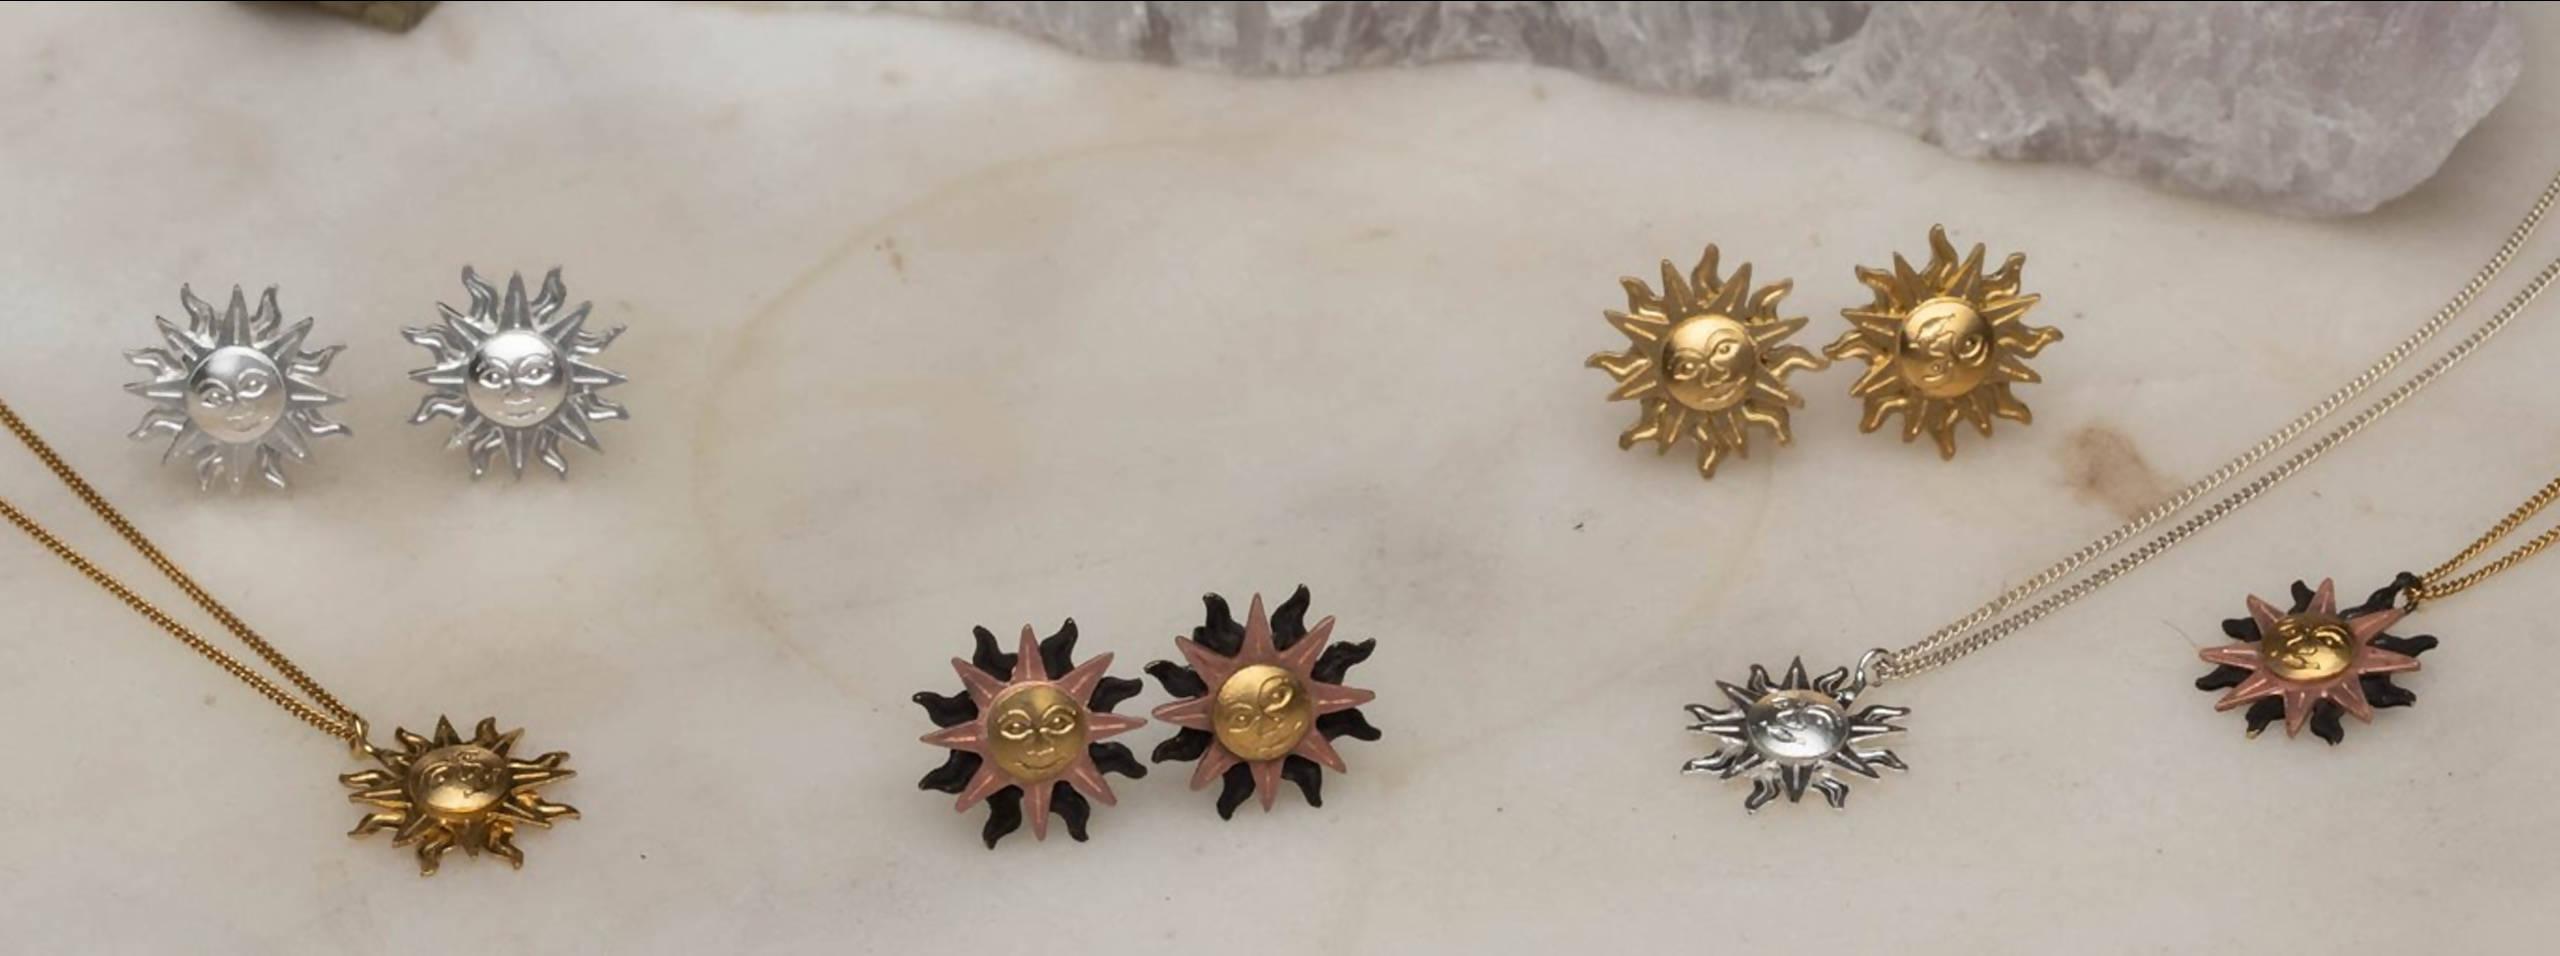 Amanda Coleman Jewellery